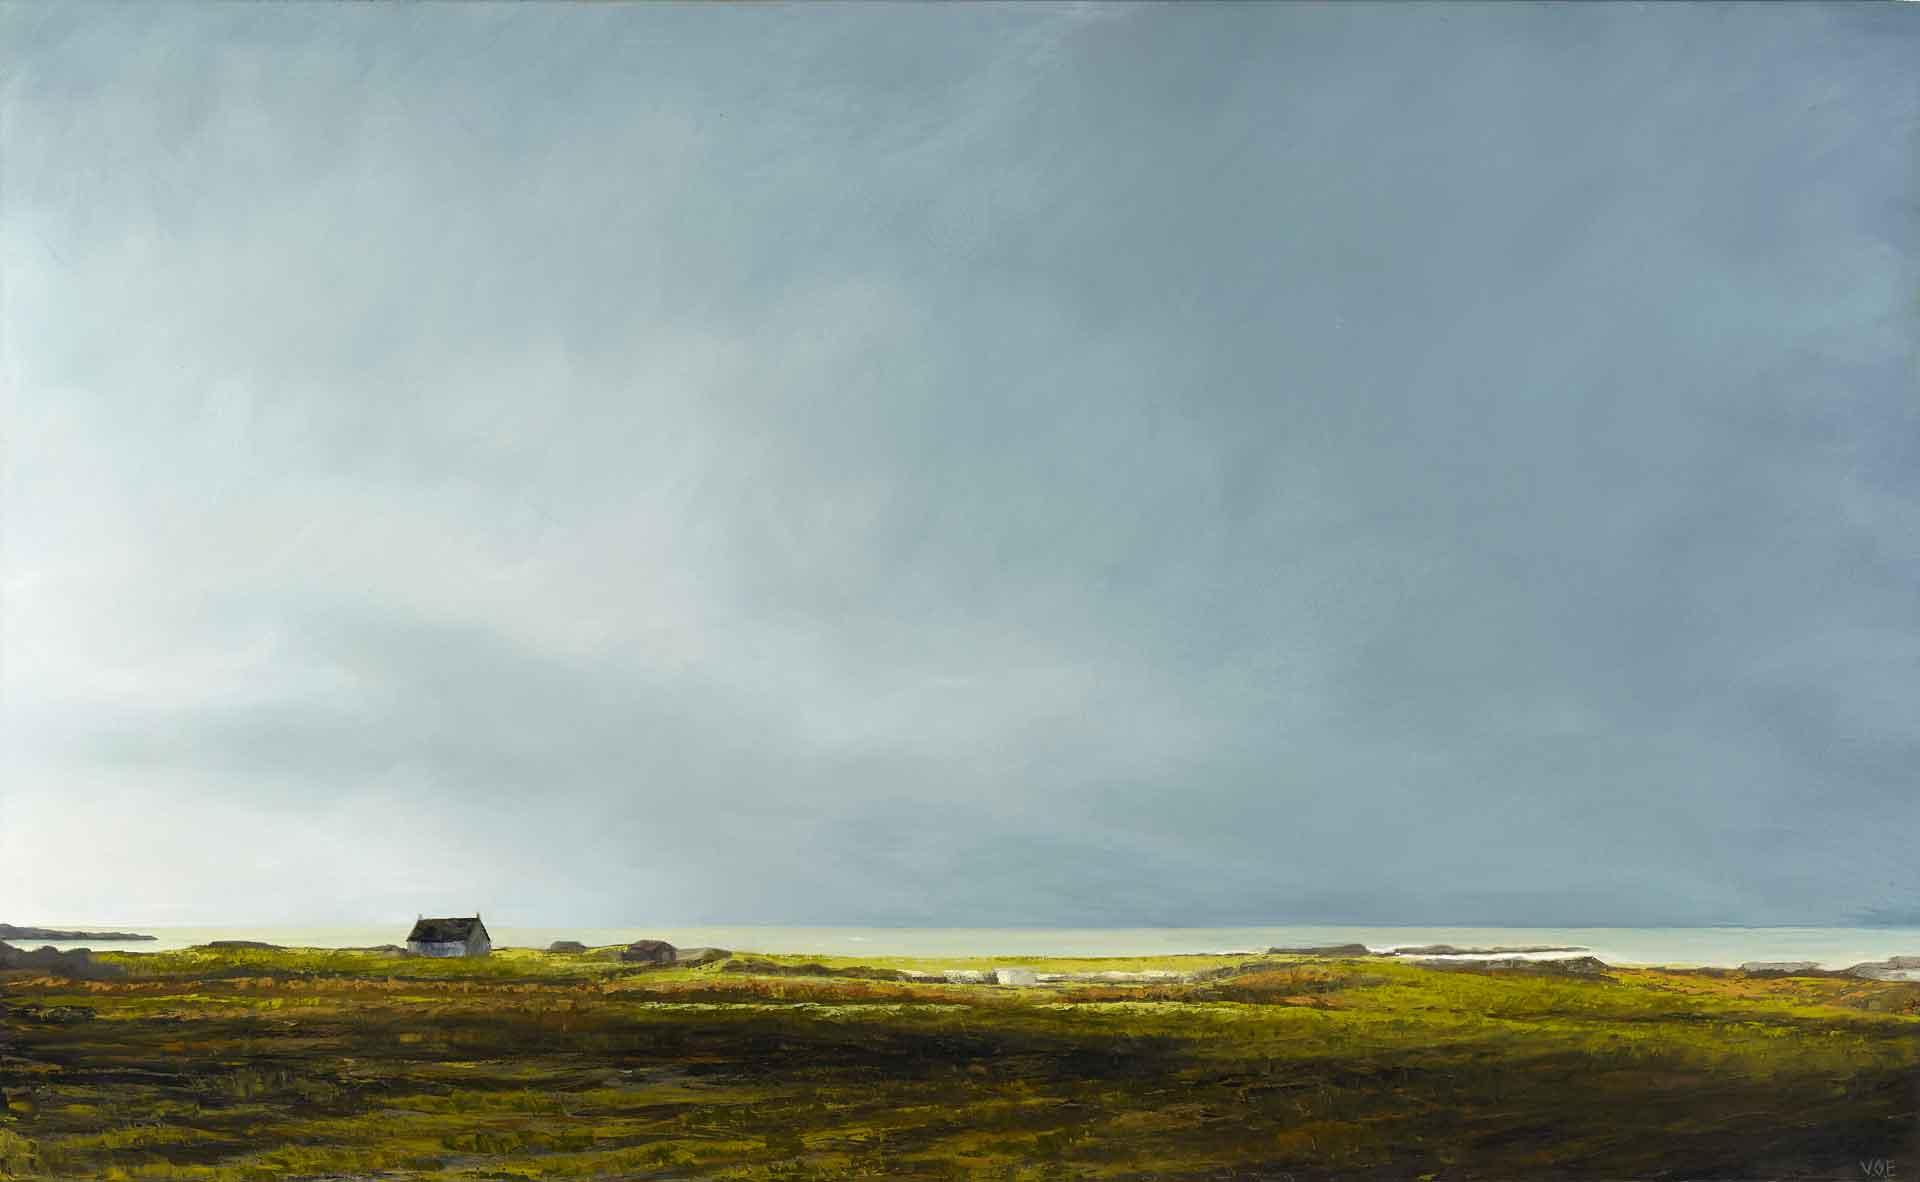 Near Arisaig. 146 x 89 cm. Oil on canvas. SOLD